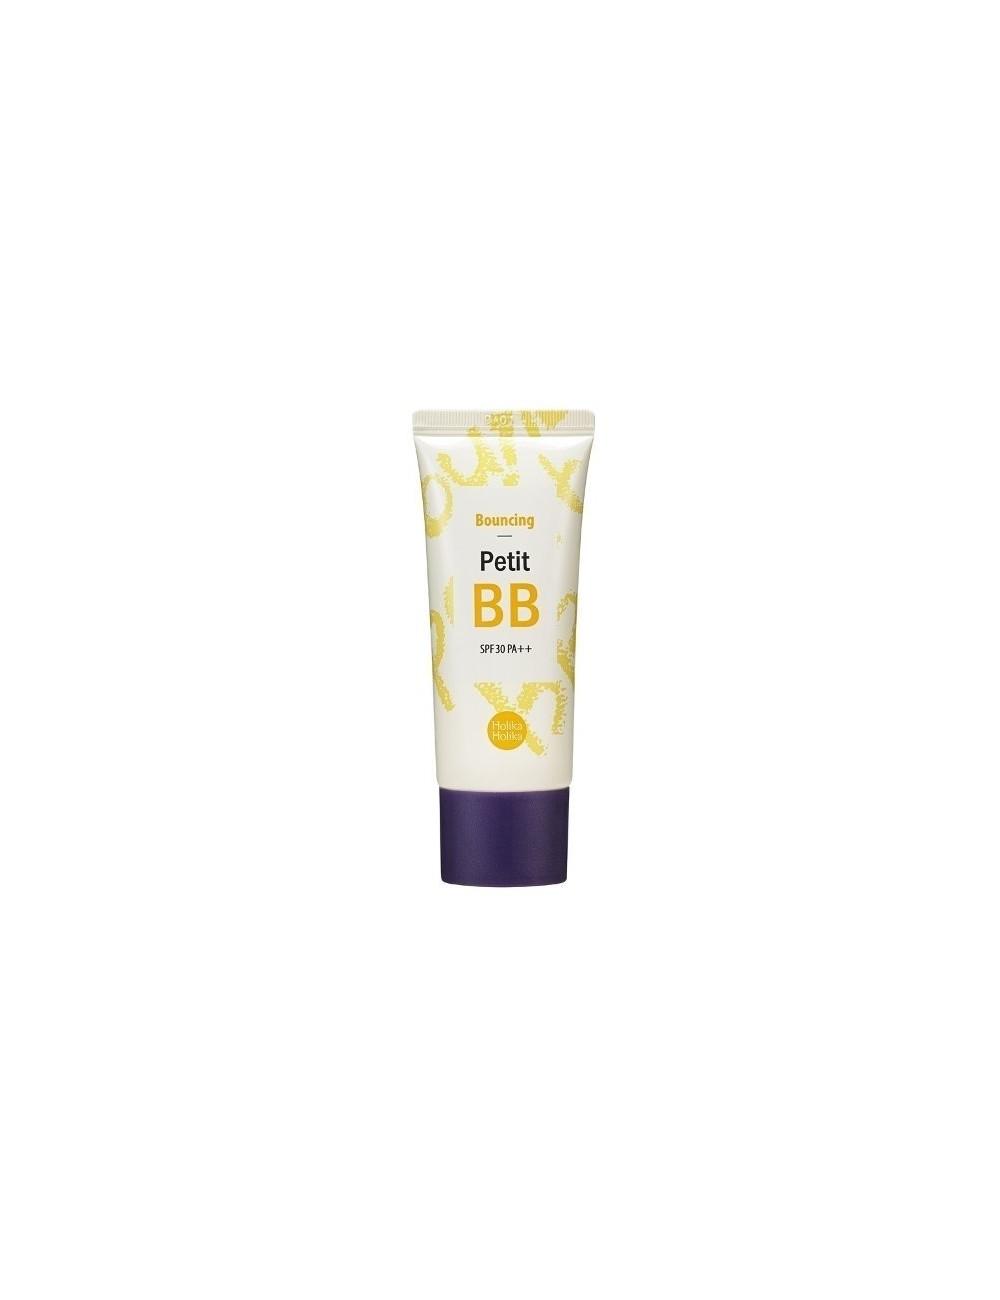 Holika Holika BB Cream Bouncing Petit BB SPF 30 PA++